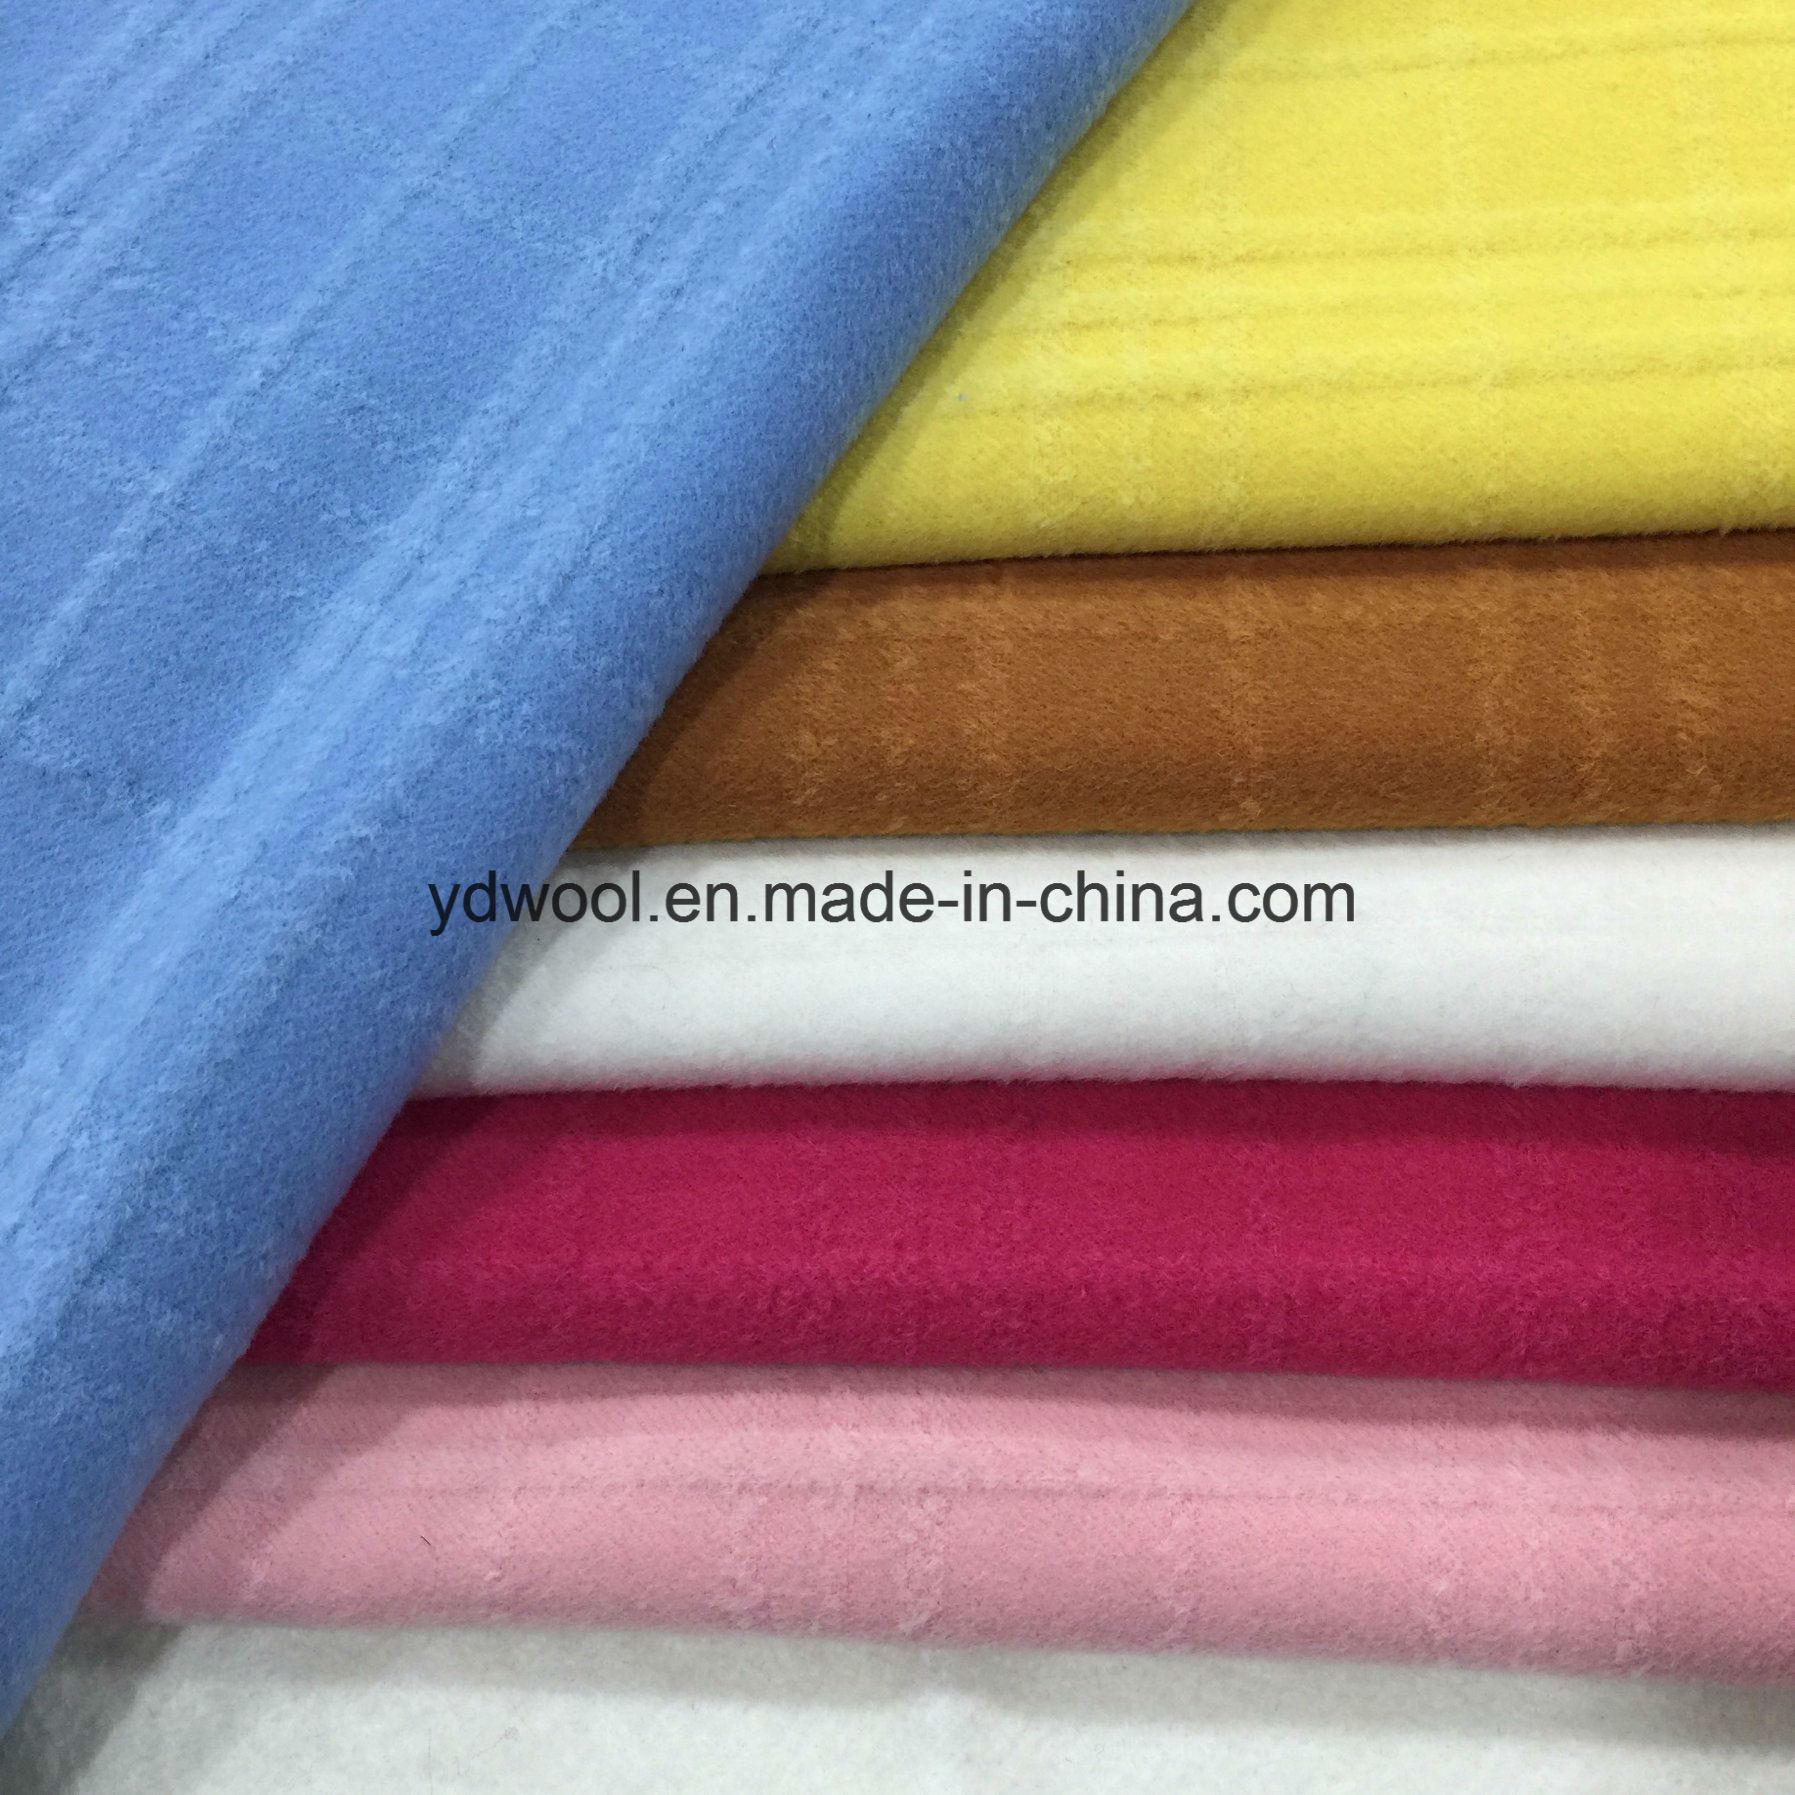 Jacquard Check Wool Fabric Ready Greige Fabric